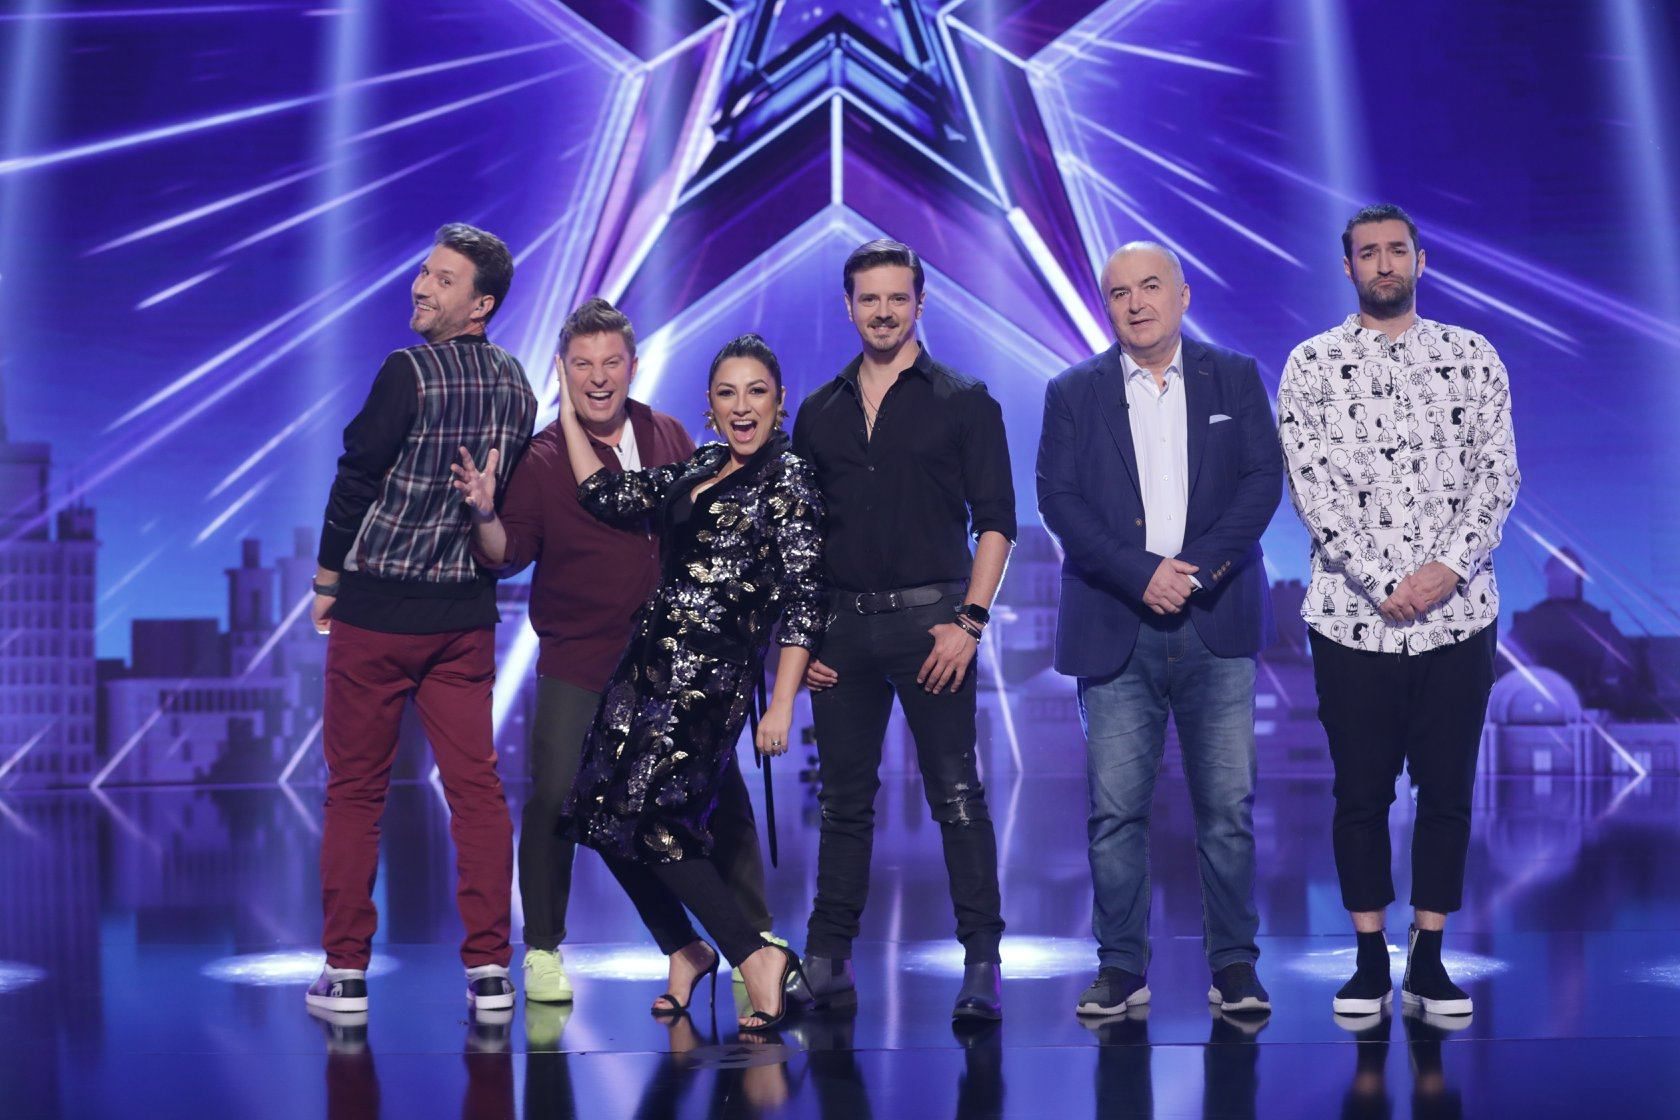 Românii au Talent Live pe Pro TV - Vineri, 10 mai